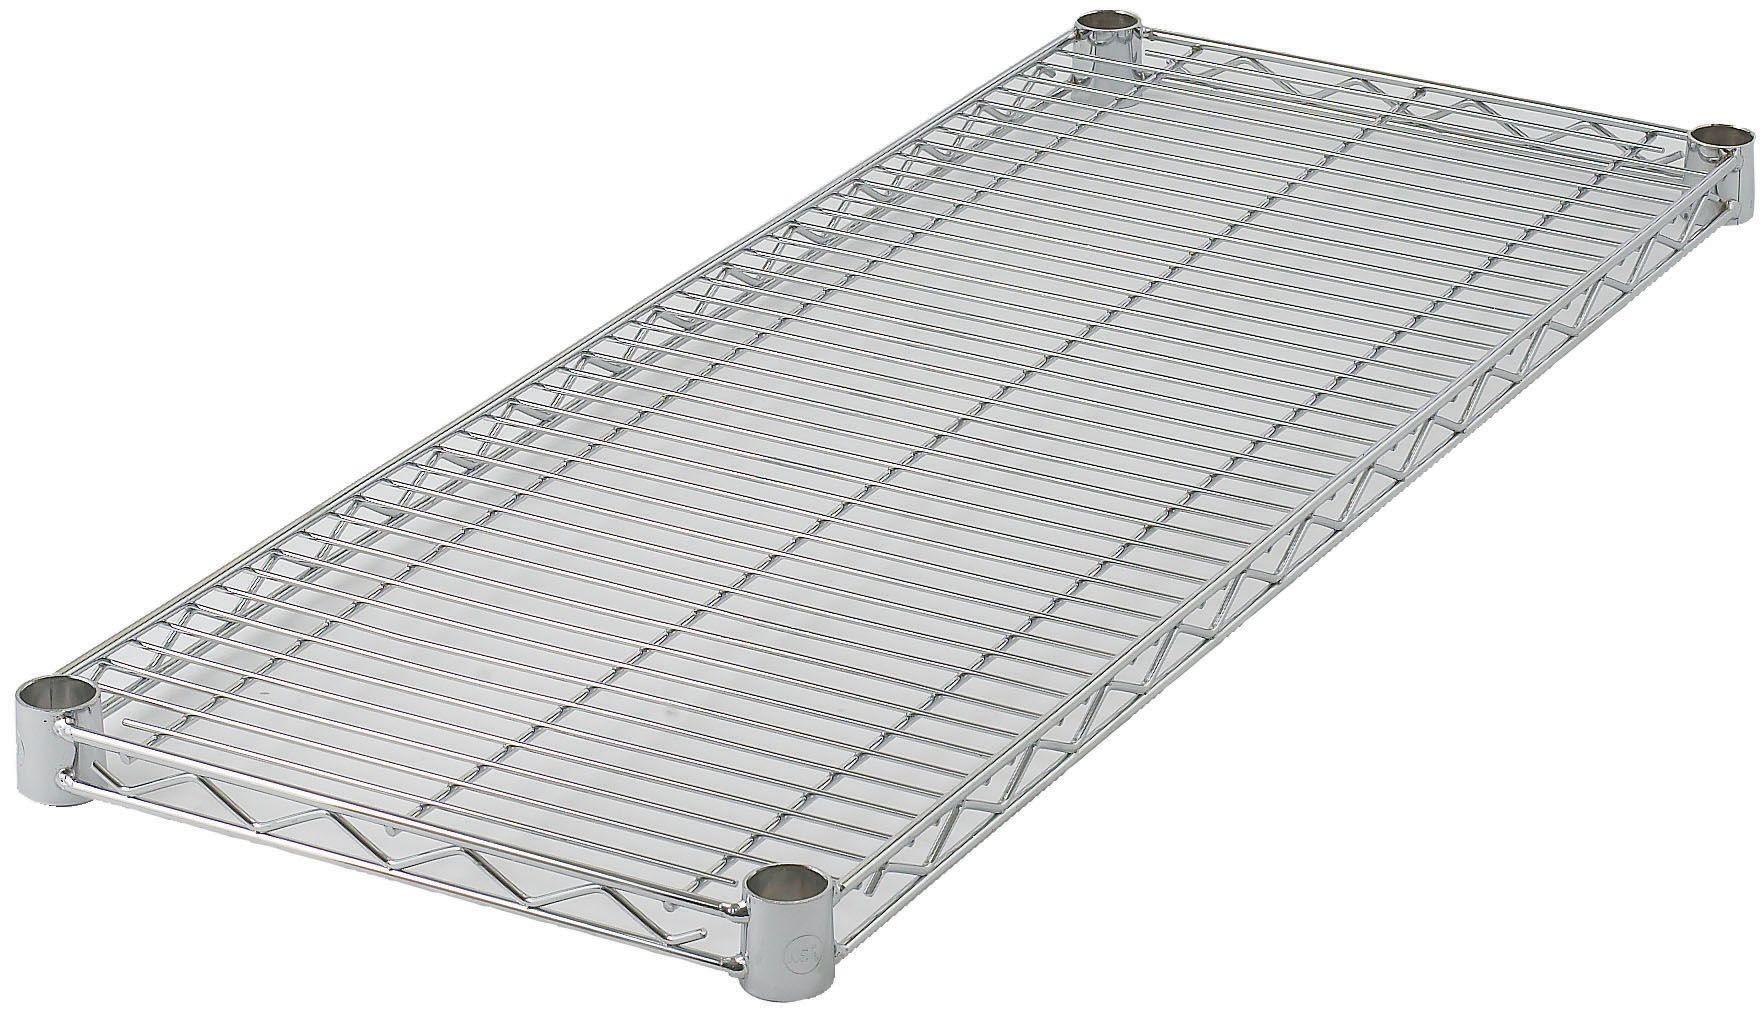 "Winco VC-1430 Chrome-Plated Wire Shelf 14"" x 30"""